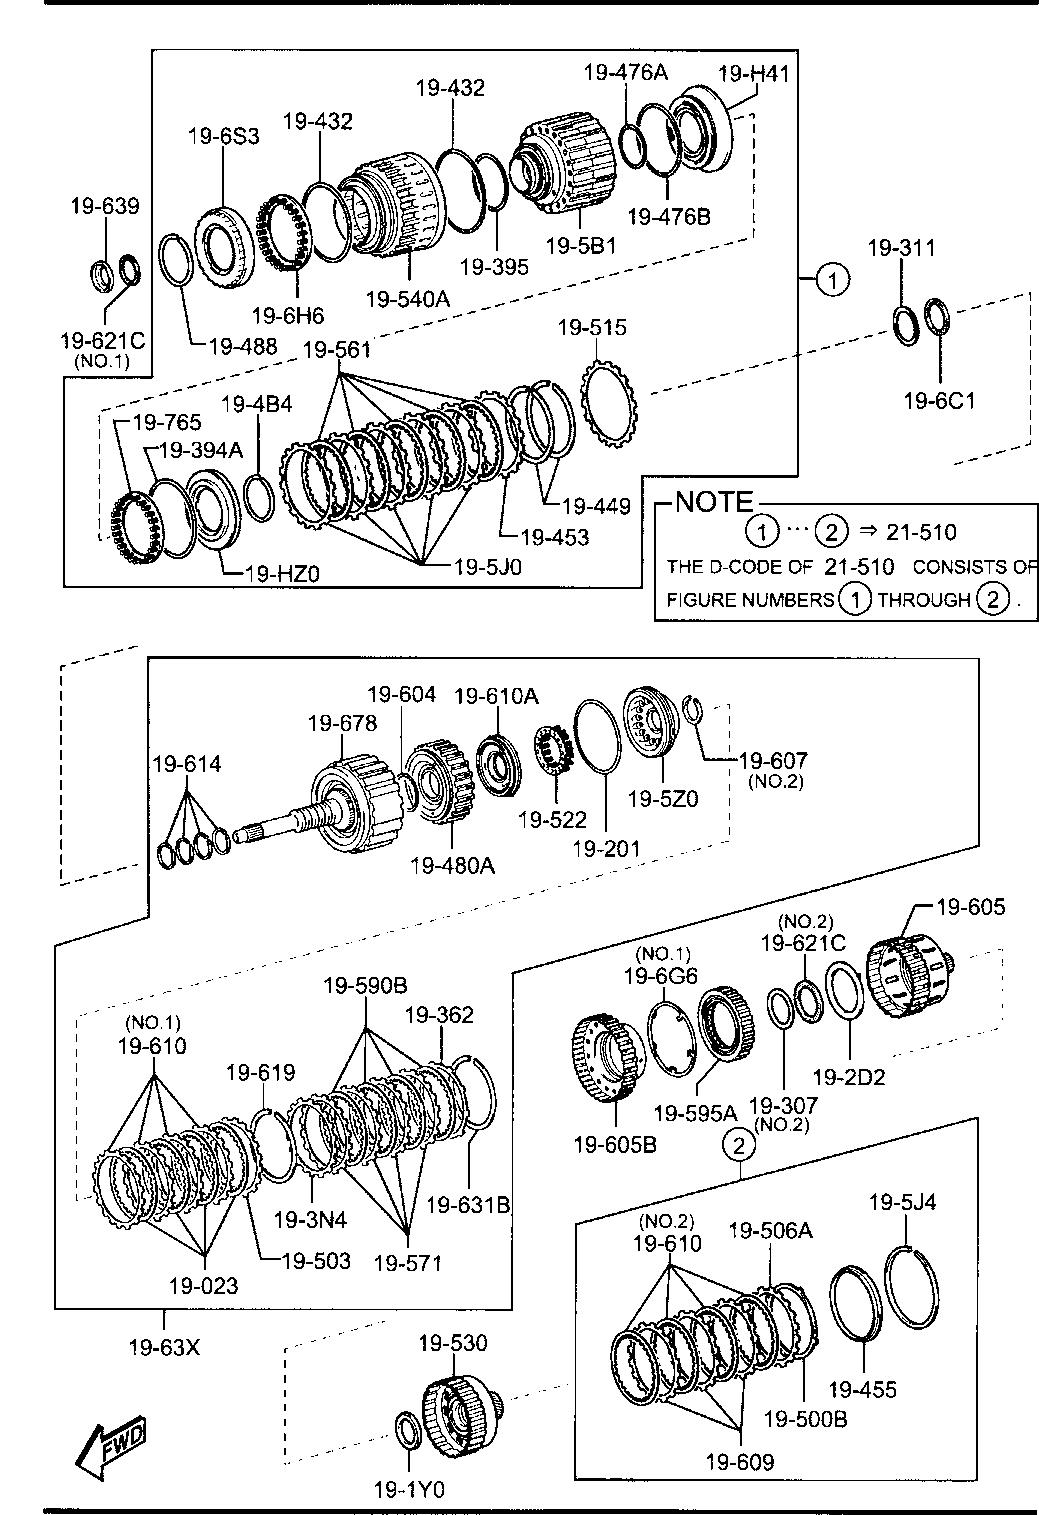 2013 Miata Gasoline Engine 4 Cylinder Transmission 1930a Slave Diagram